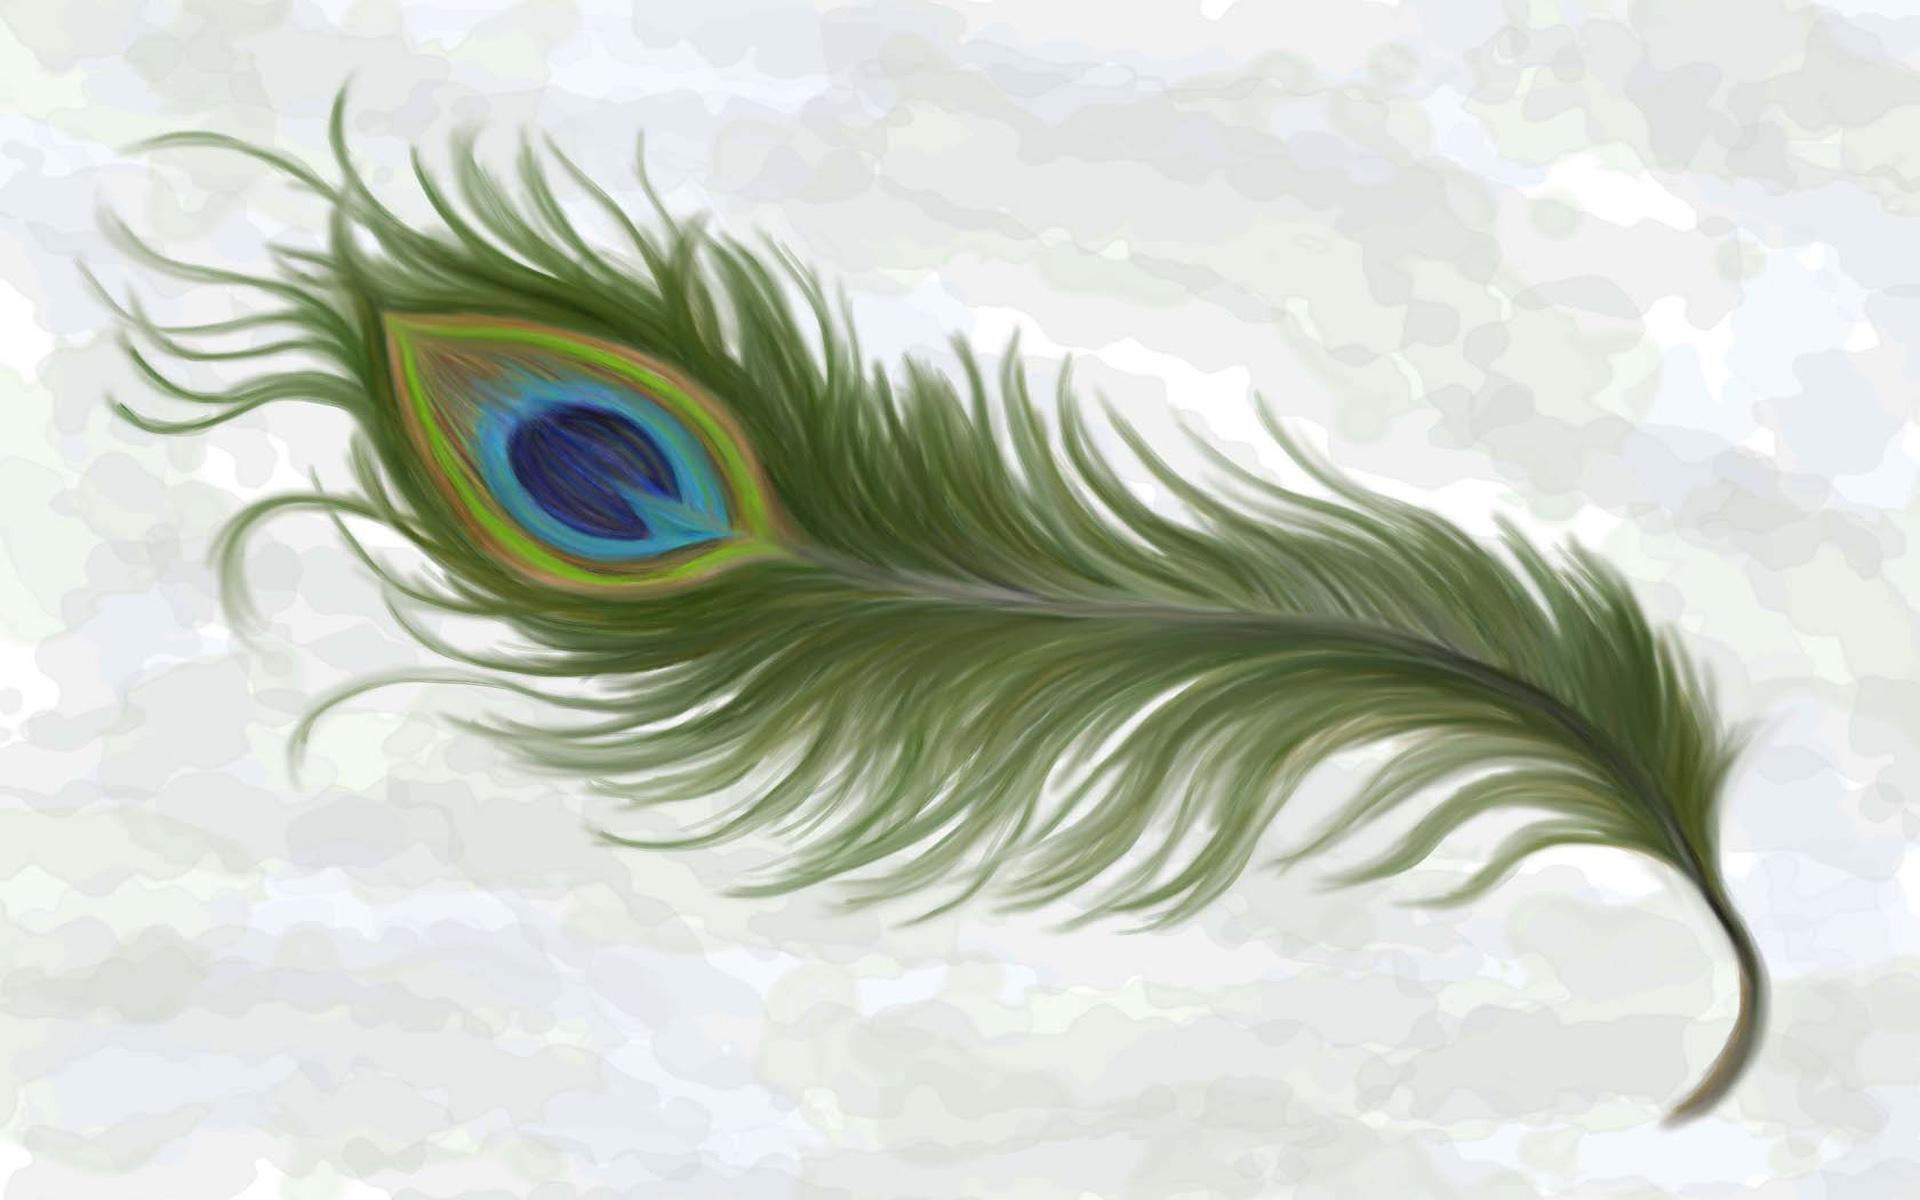 Pin Peacock Feather Wallpaper 1920x1200